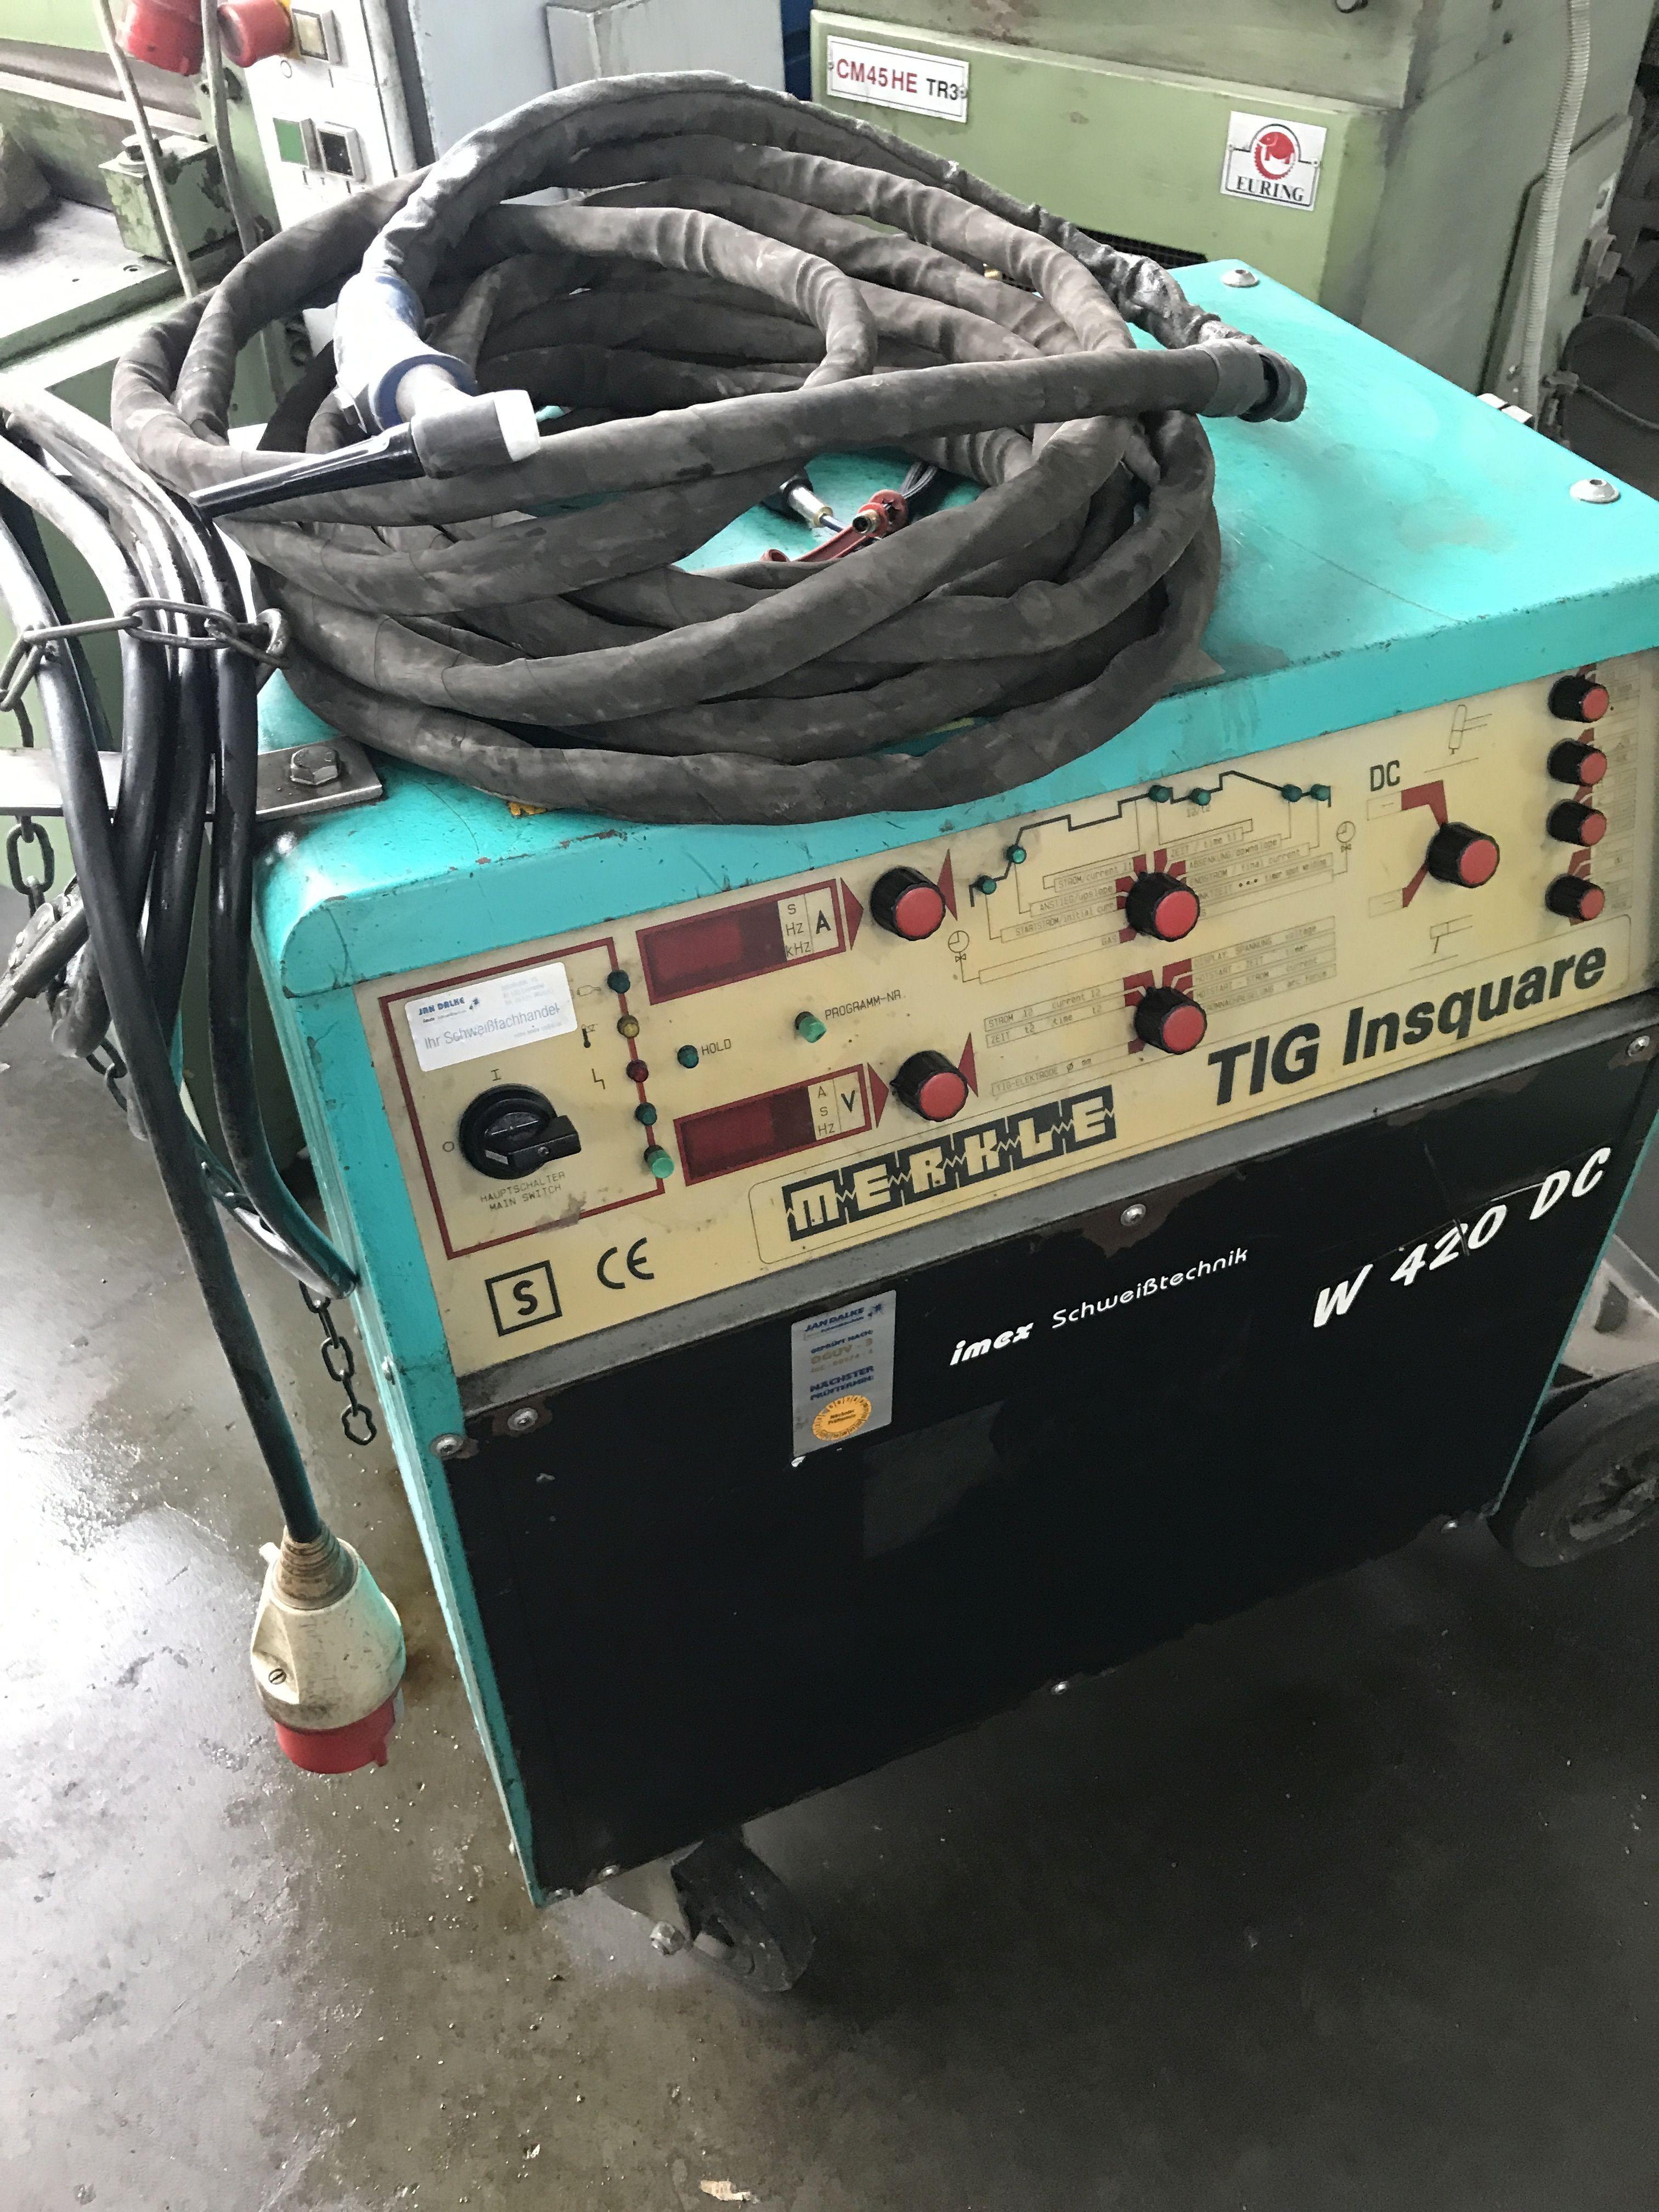 WIG сварочные аппараты MERKLE W 420 DC TIG Insquare фото на Industry-Pilot